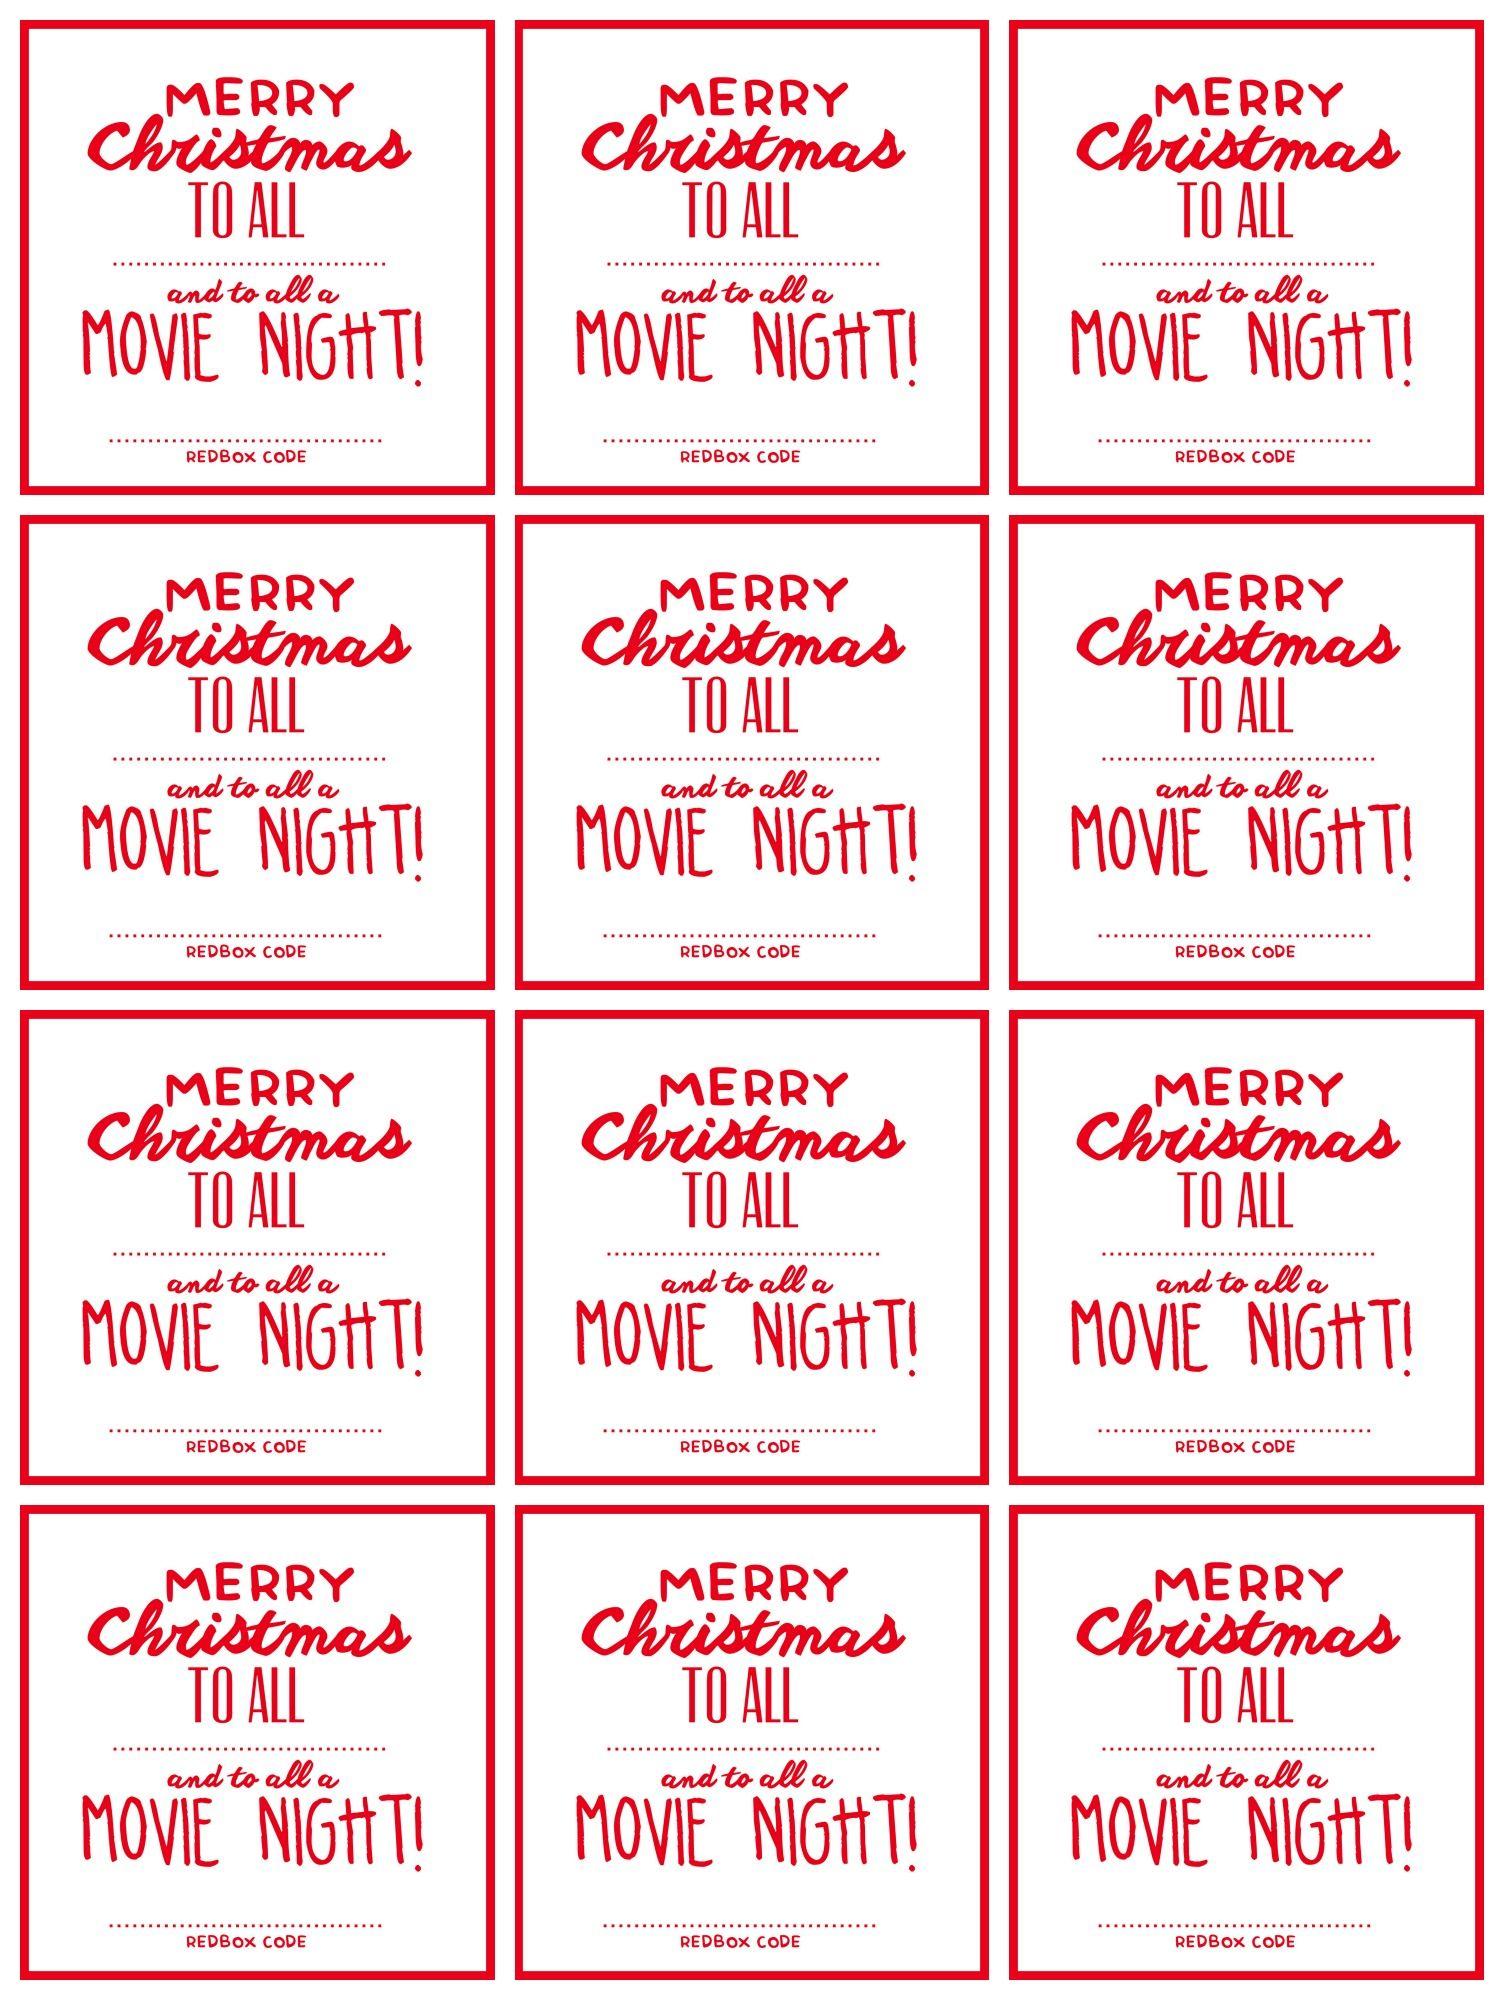 redbox codes group printable teacher christmas gifts christmas gift decorations merry christmas to all - Redbox Christmas Movies